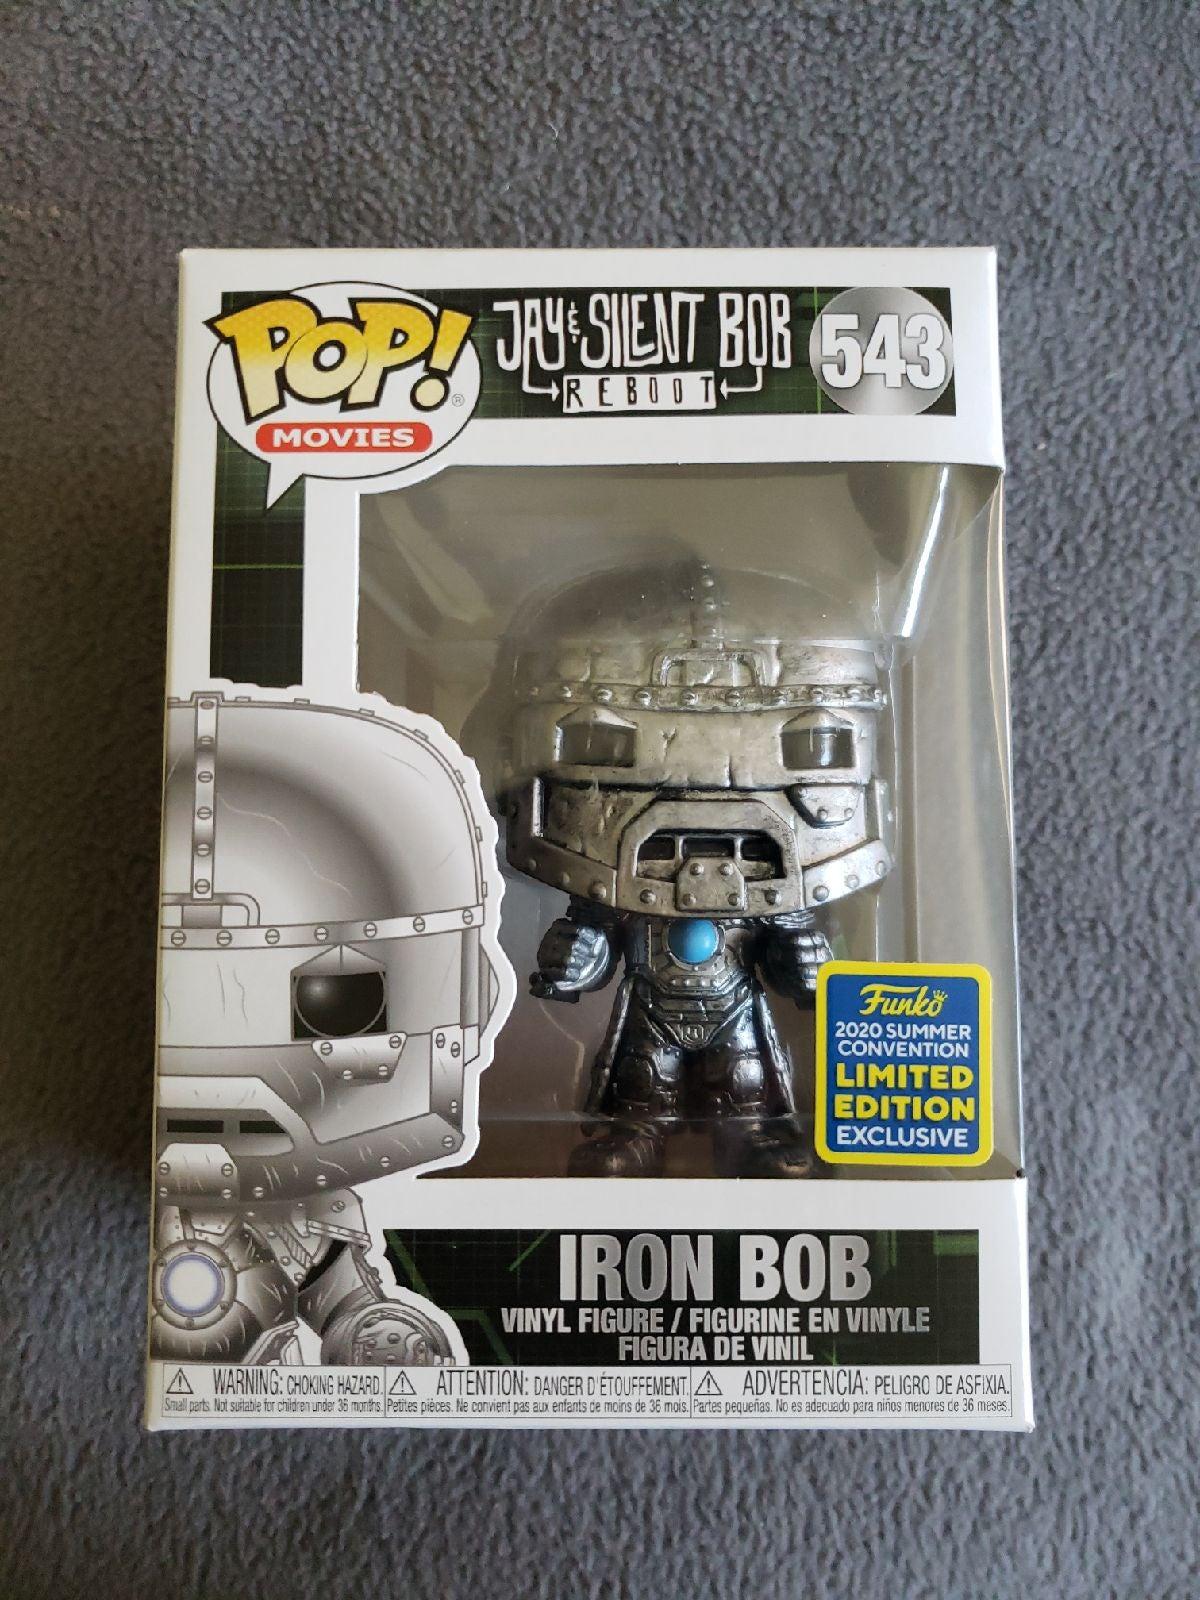 Funko Pop Iron Bob